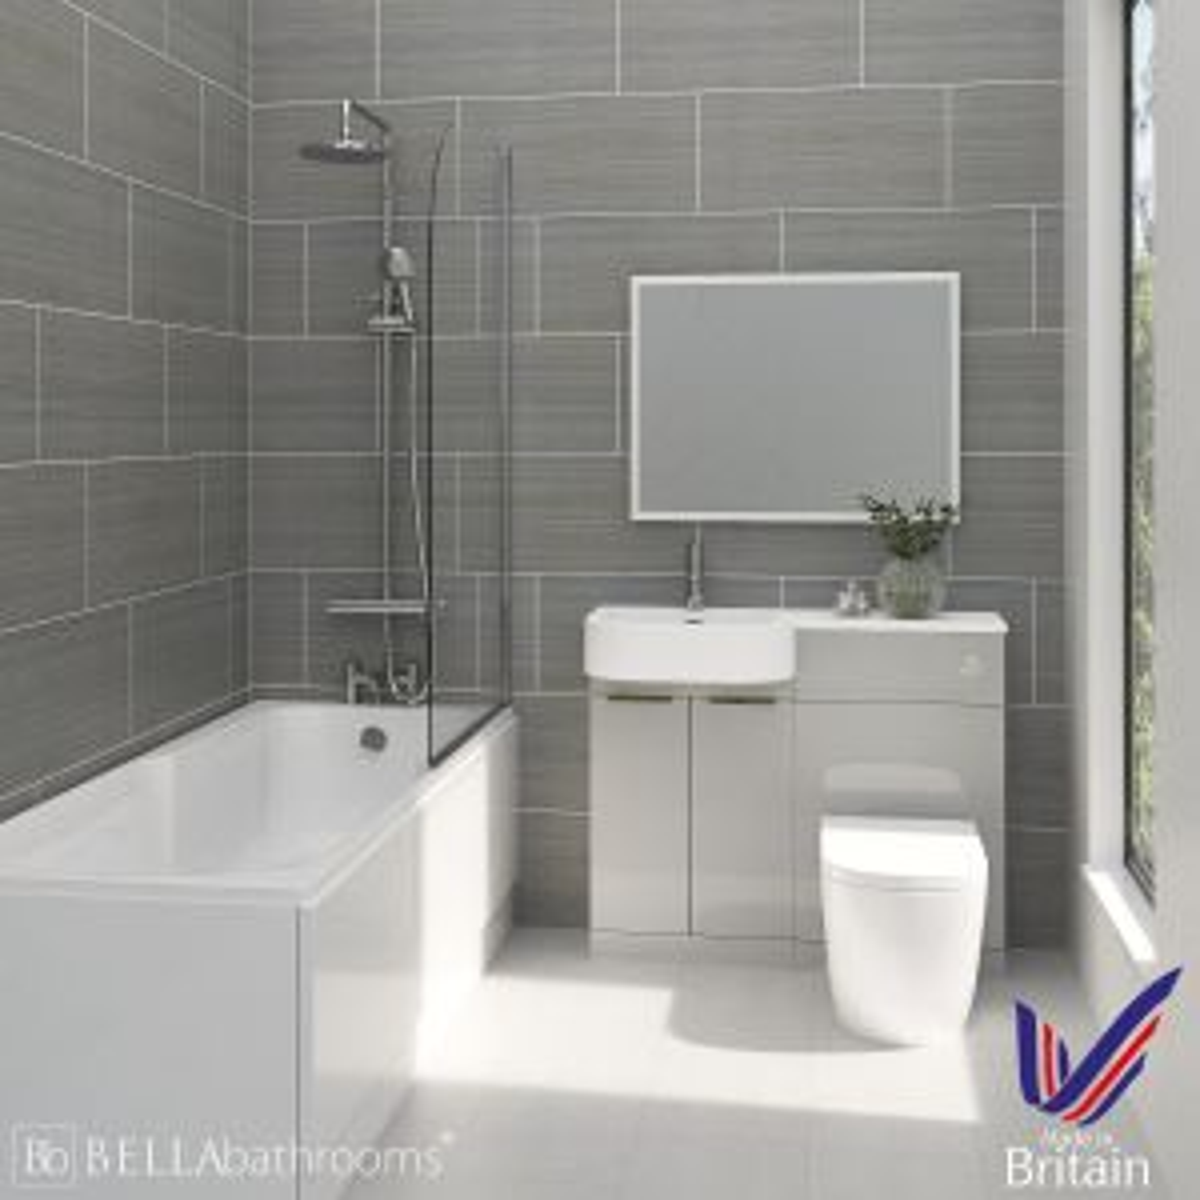 Elation Combination P Shape Pearl Grey Matt Furniture Suite with Nuie Linton Shower Bath Left Hand